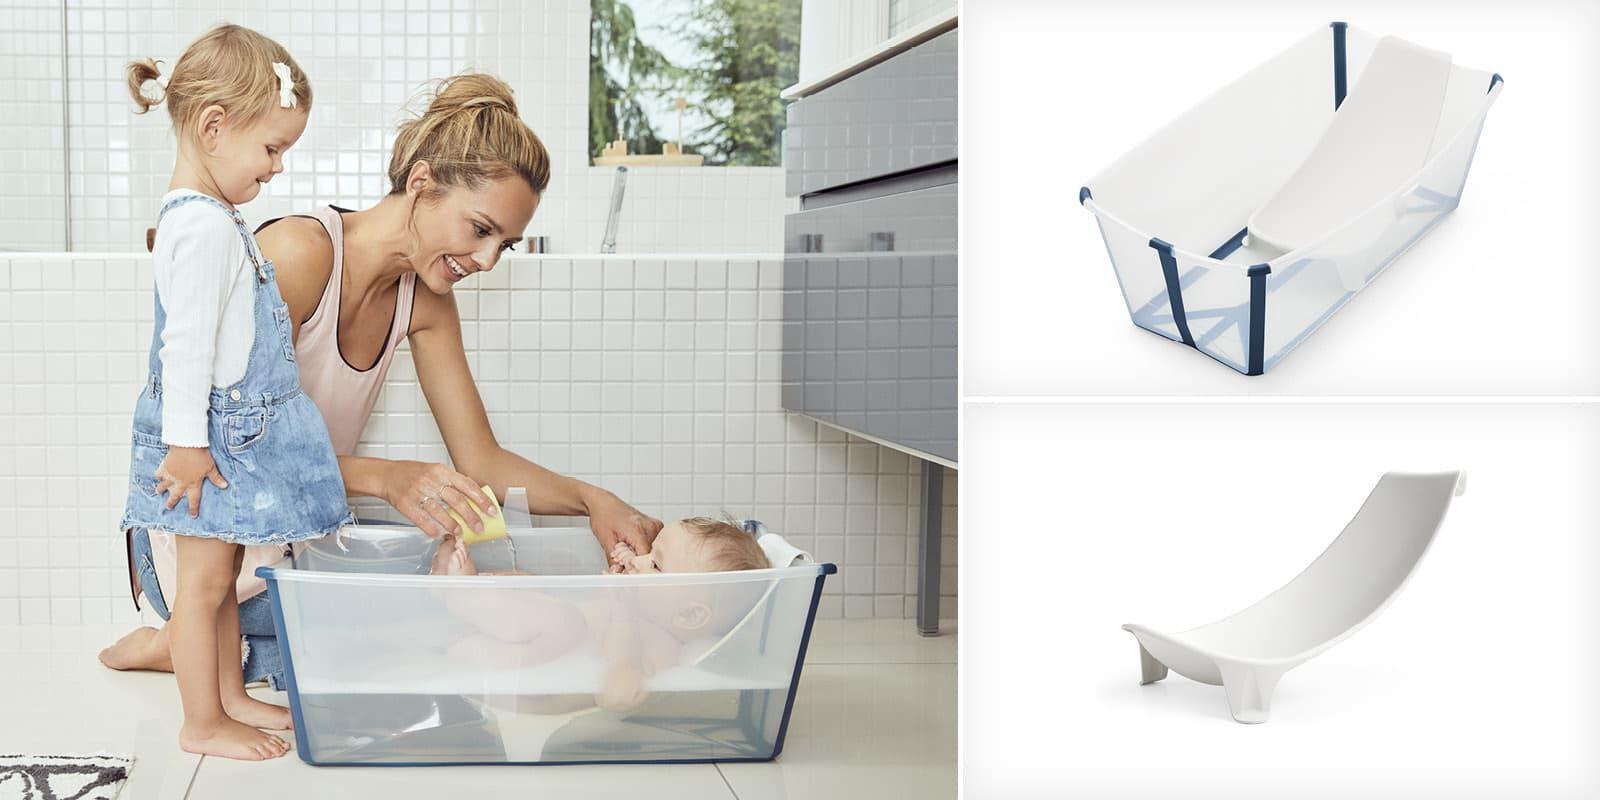 Stokke Flexi Bath Bundle with Heat-Sensitive Plug and Flexi Bath Newborn Support Transparent Blue